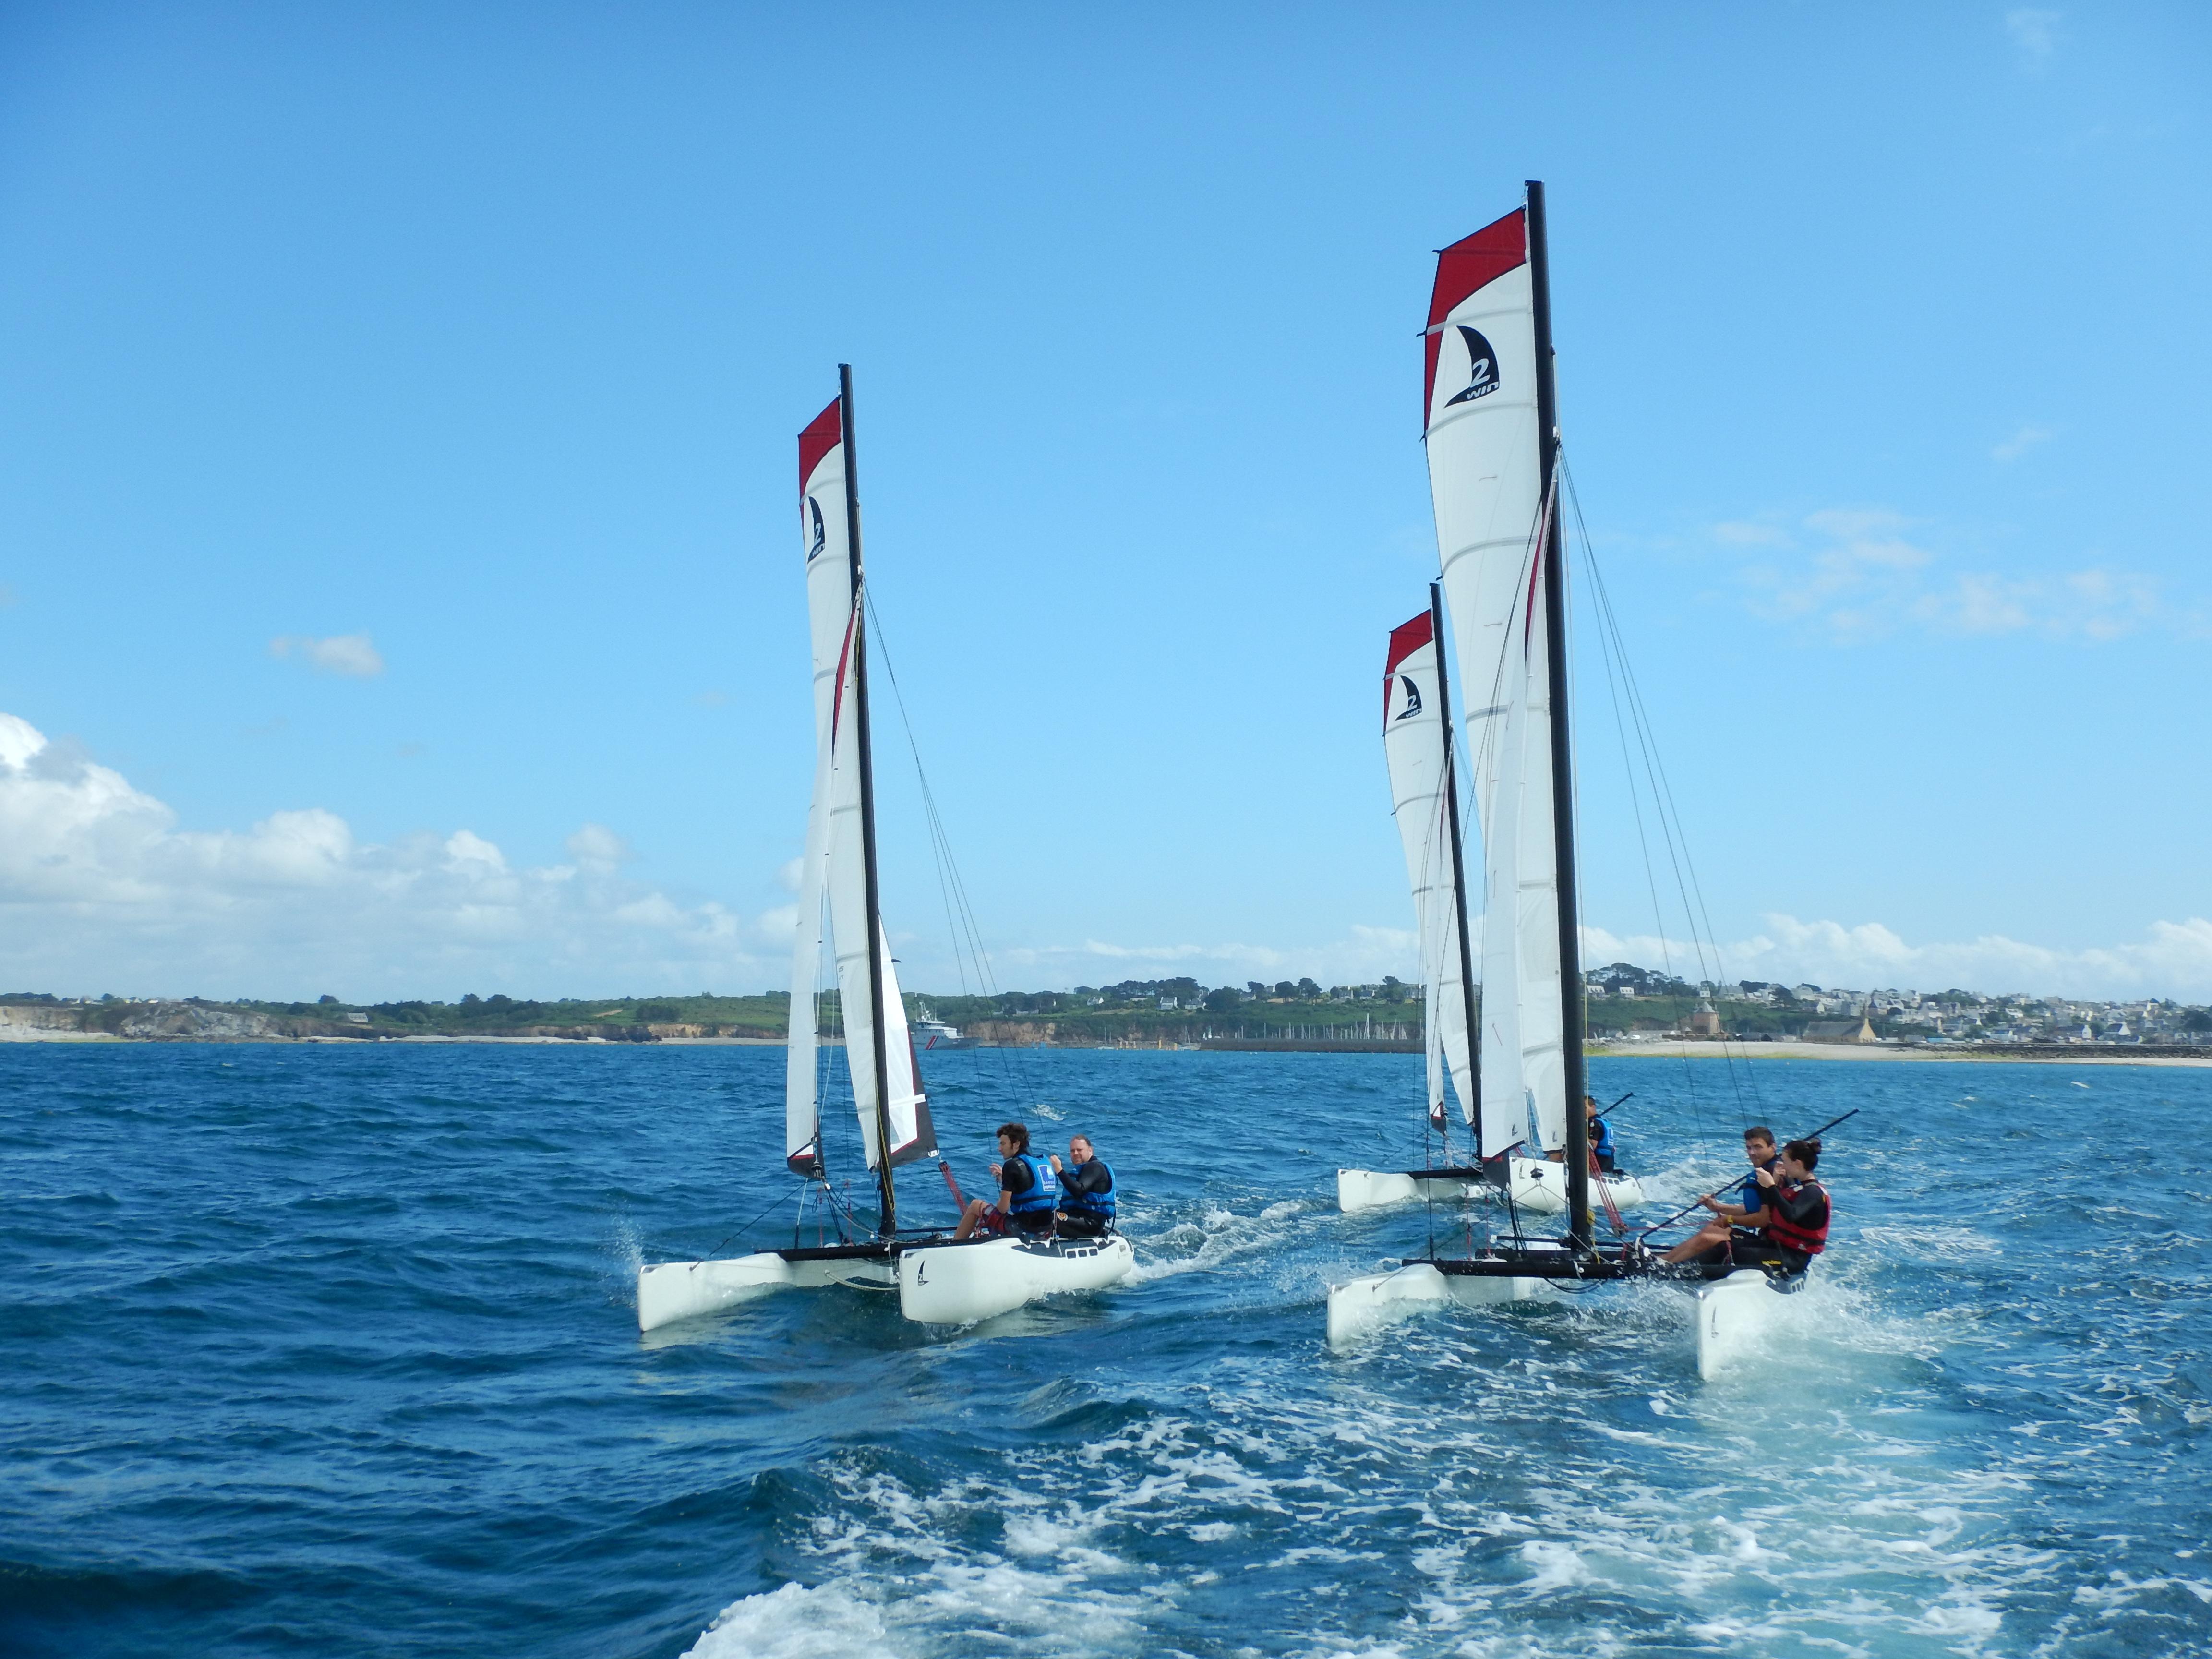 Club Léo Lagrange Camaret sur Mer